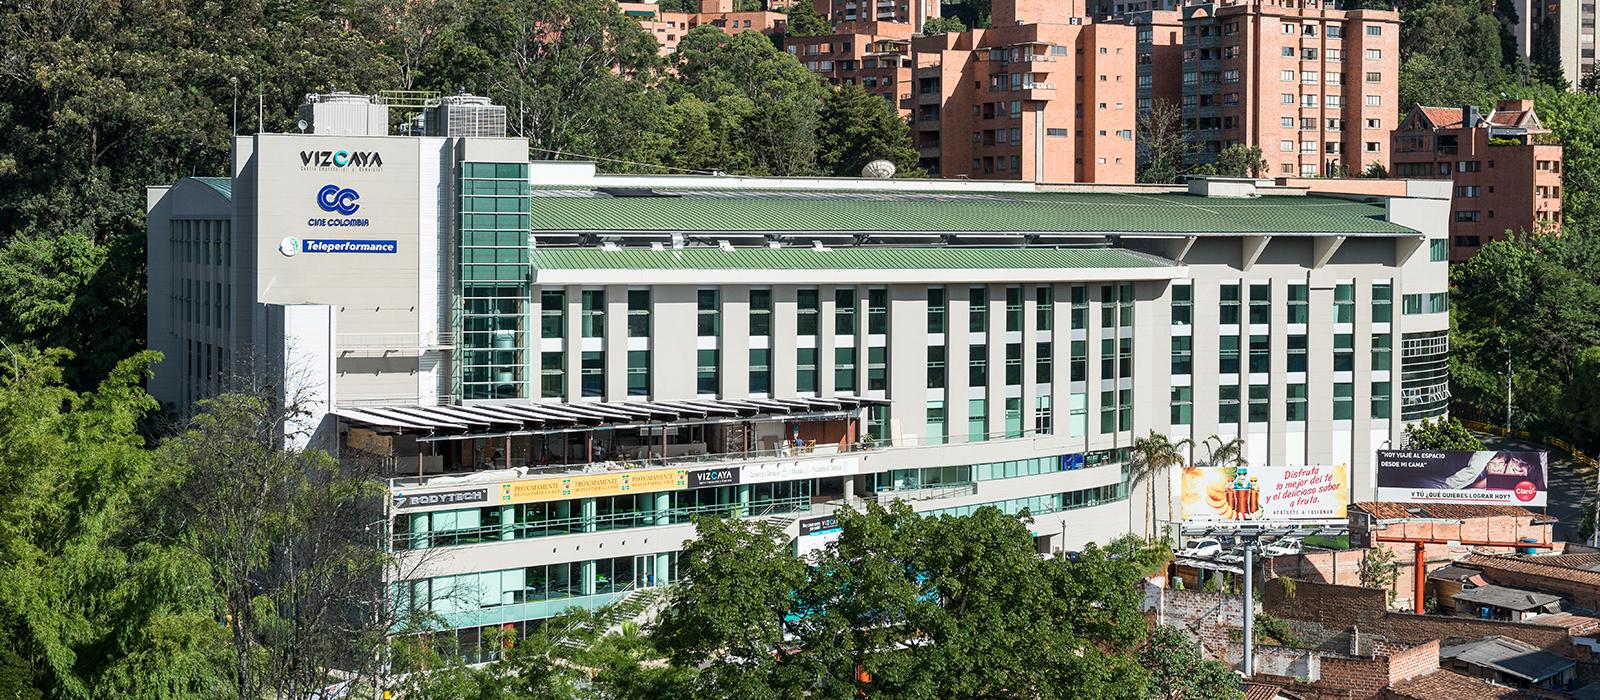 Ampliación Centro Comercial Vizcaya